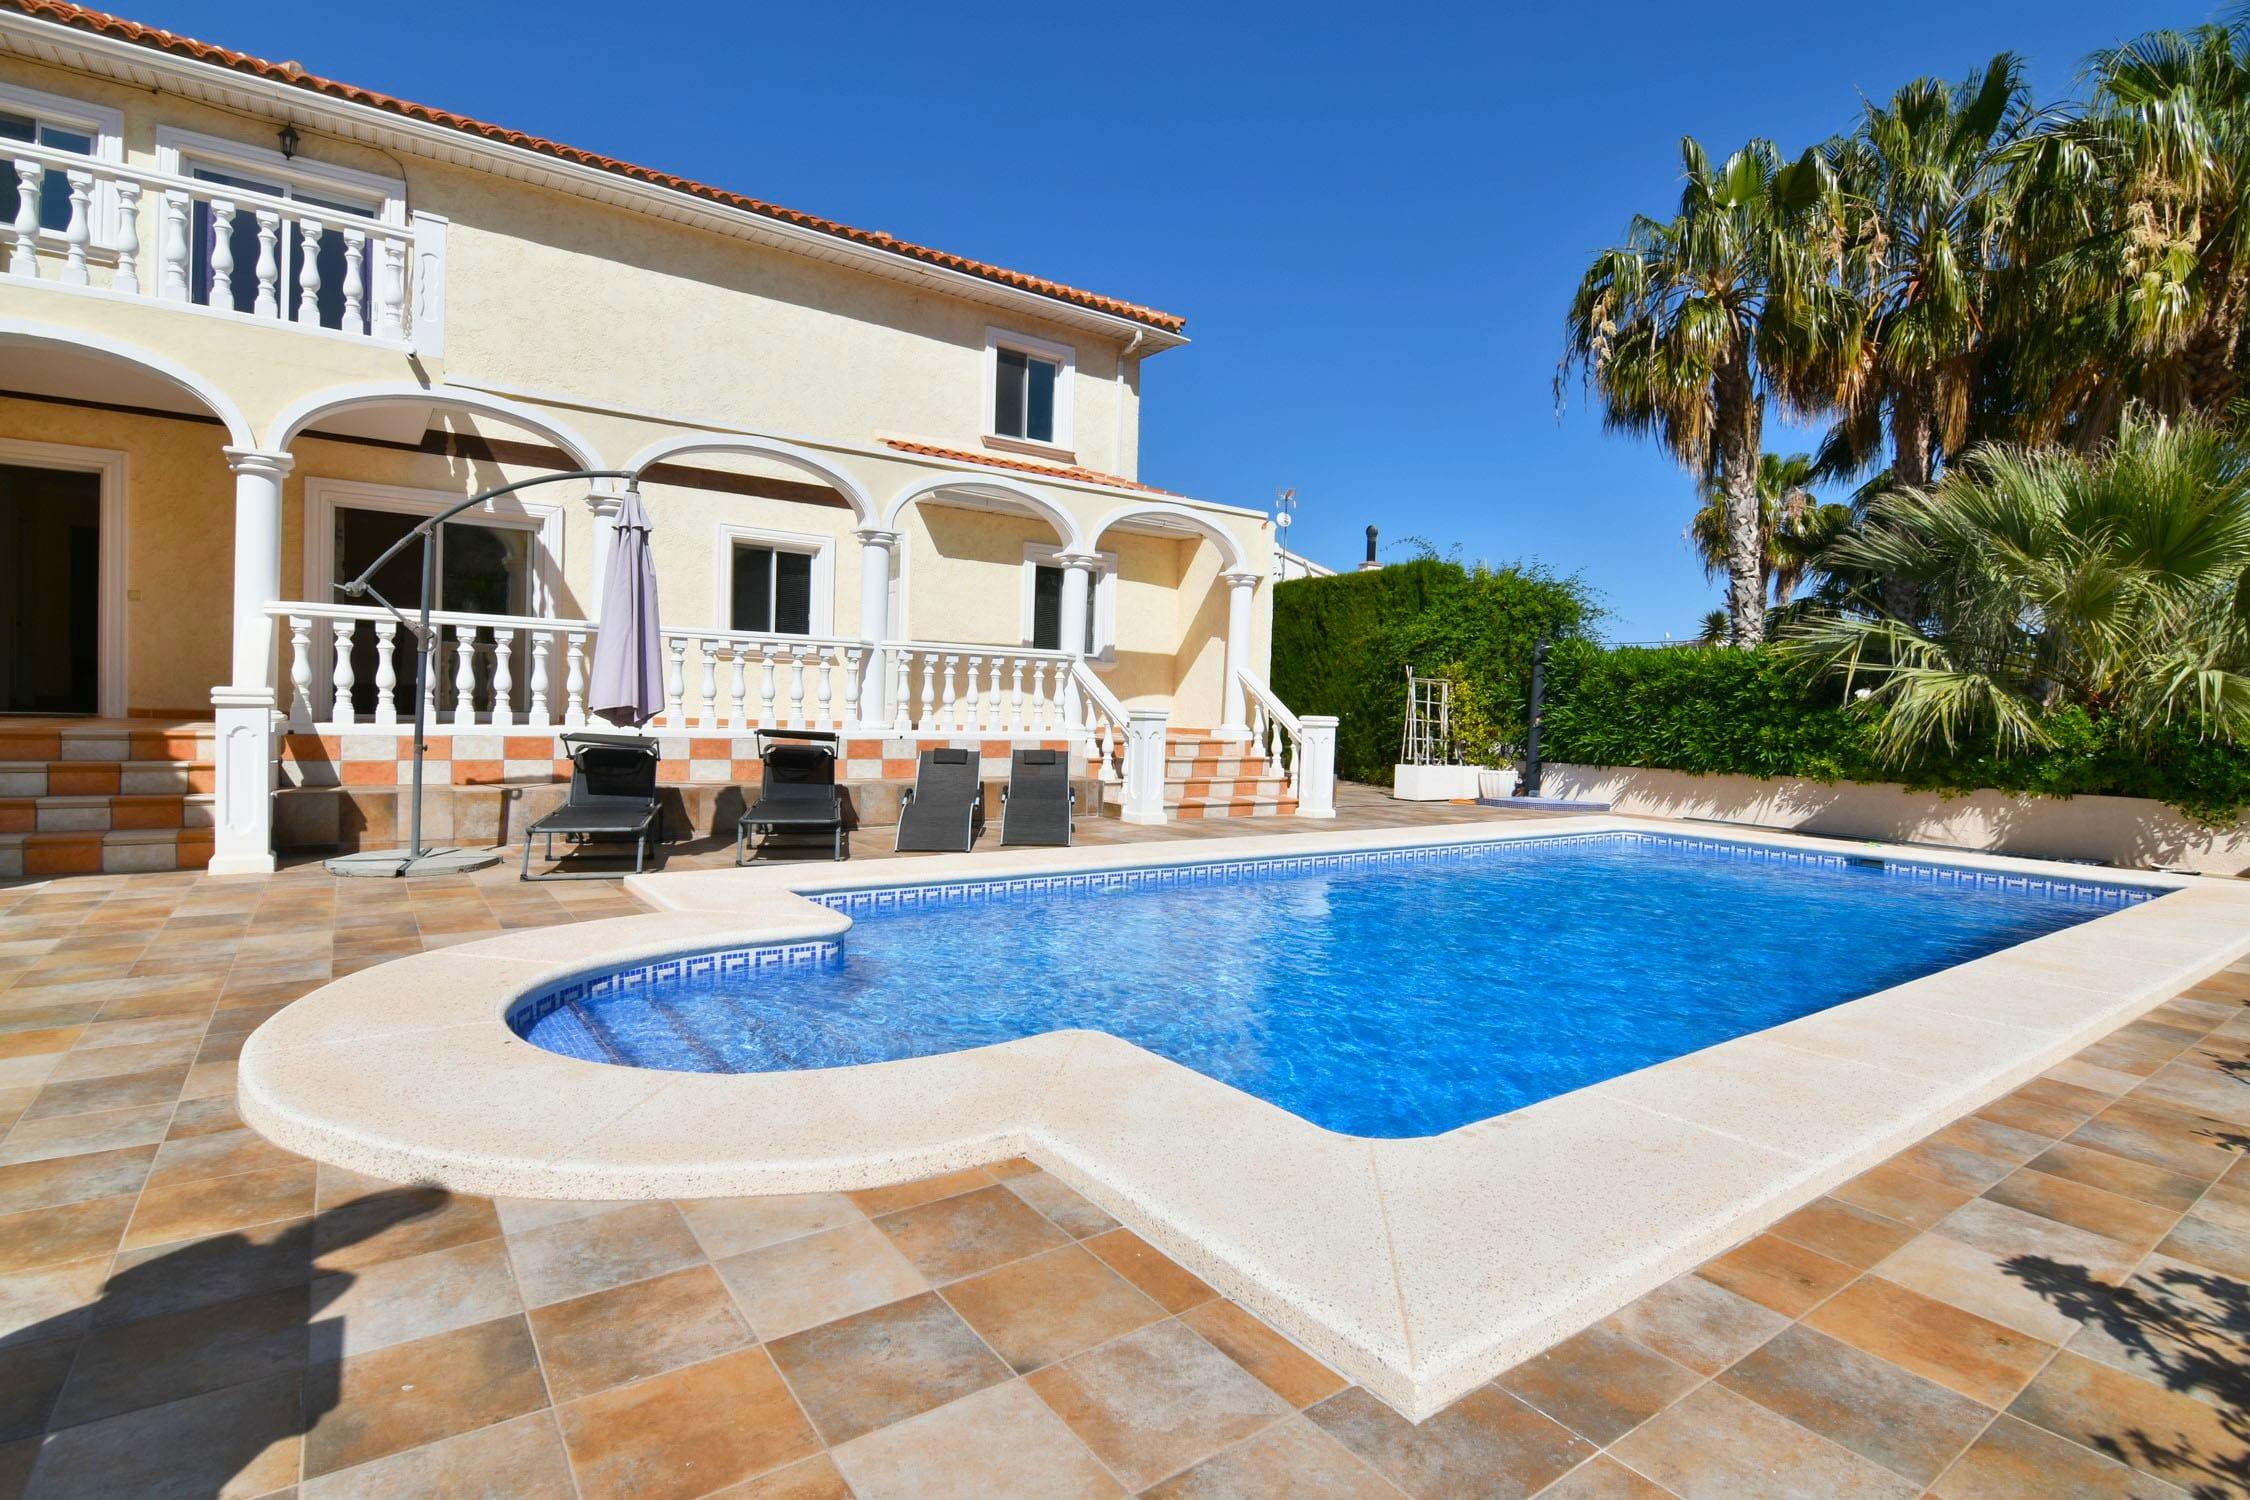 7 Bedroom Villa in Calpe